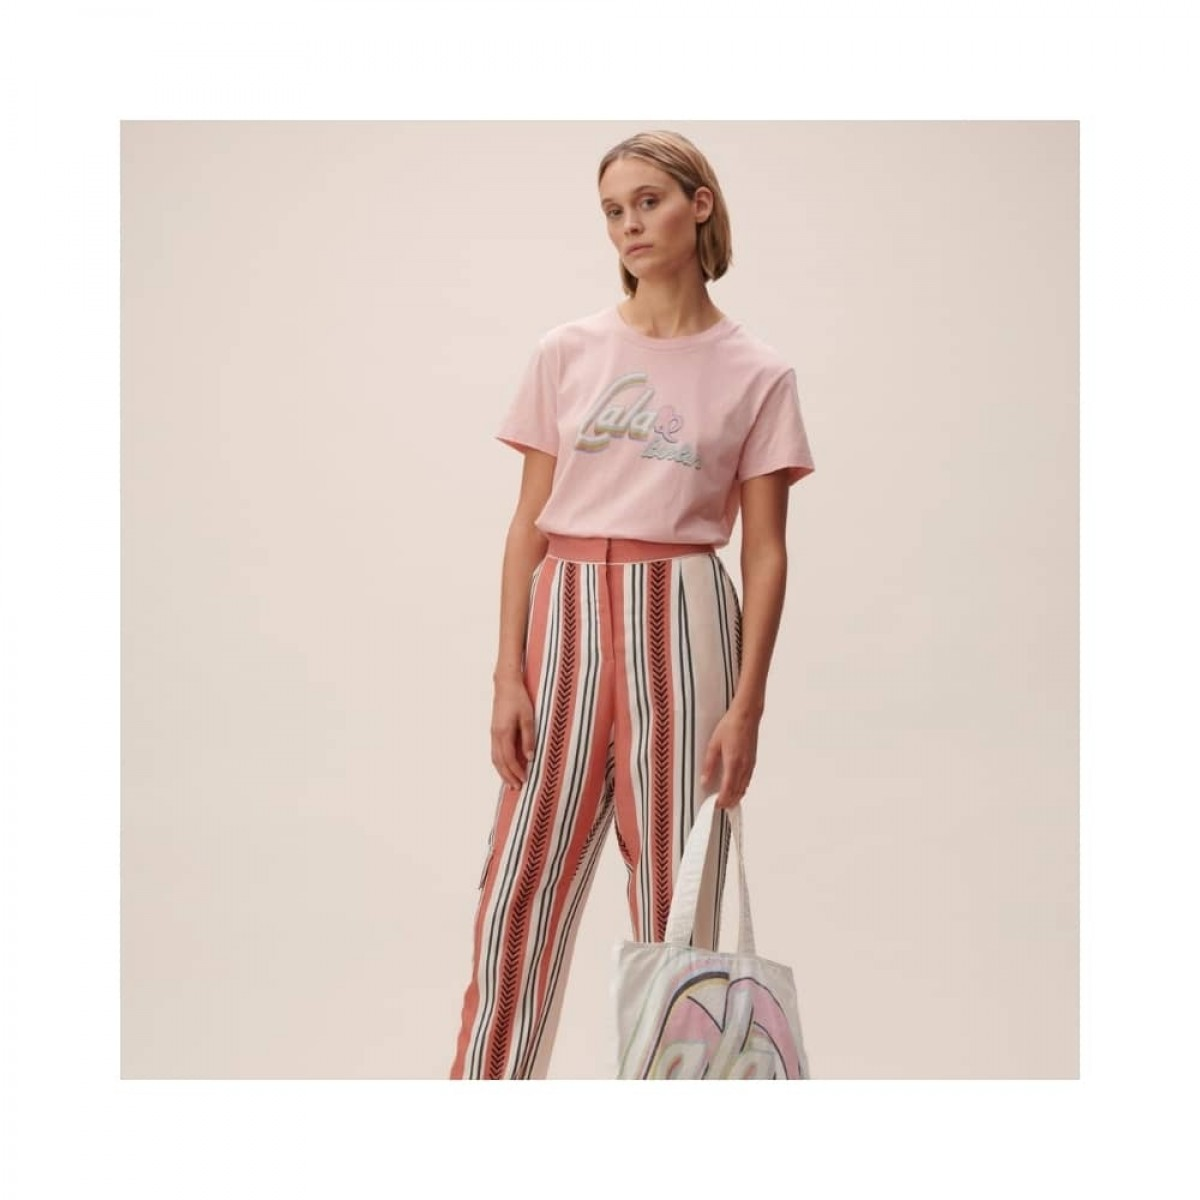 cara t-shirt - pink - model front